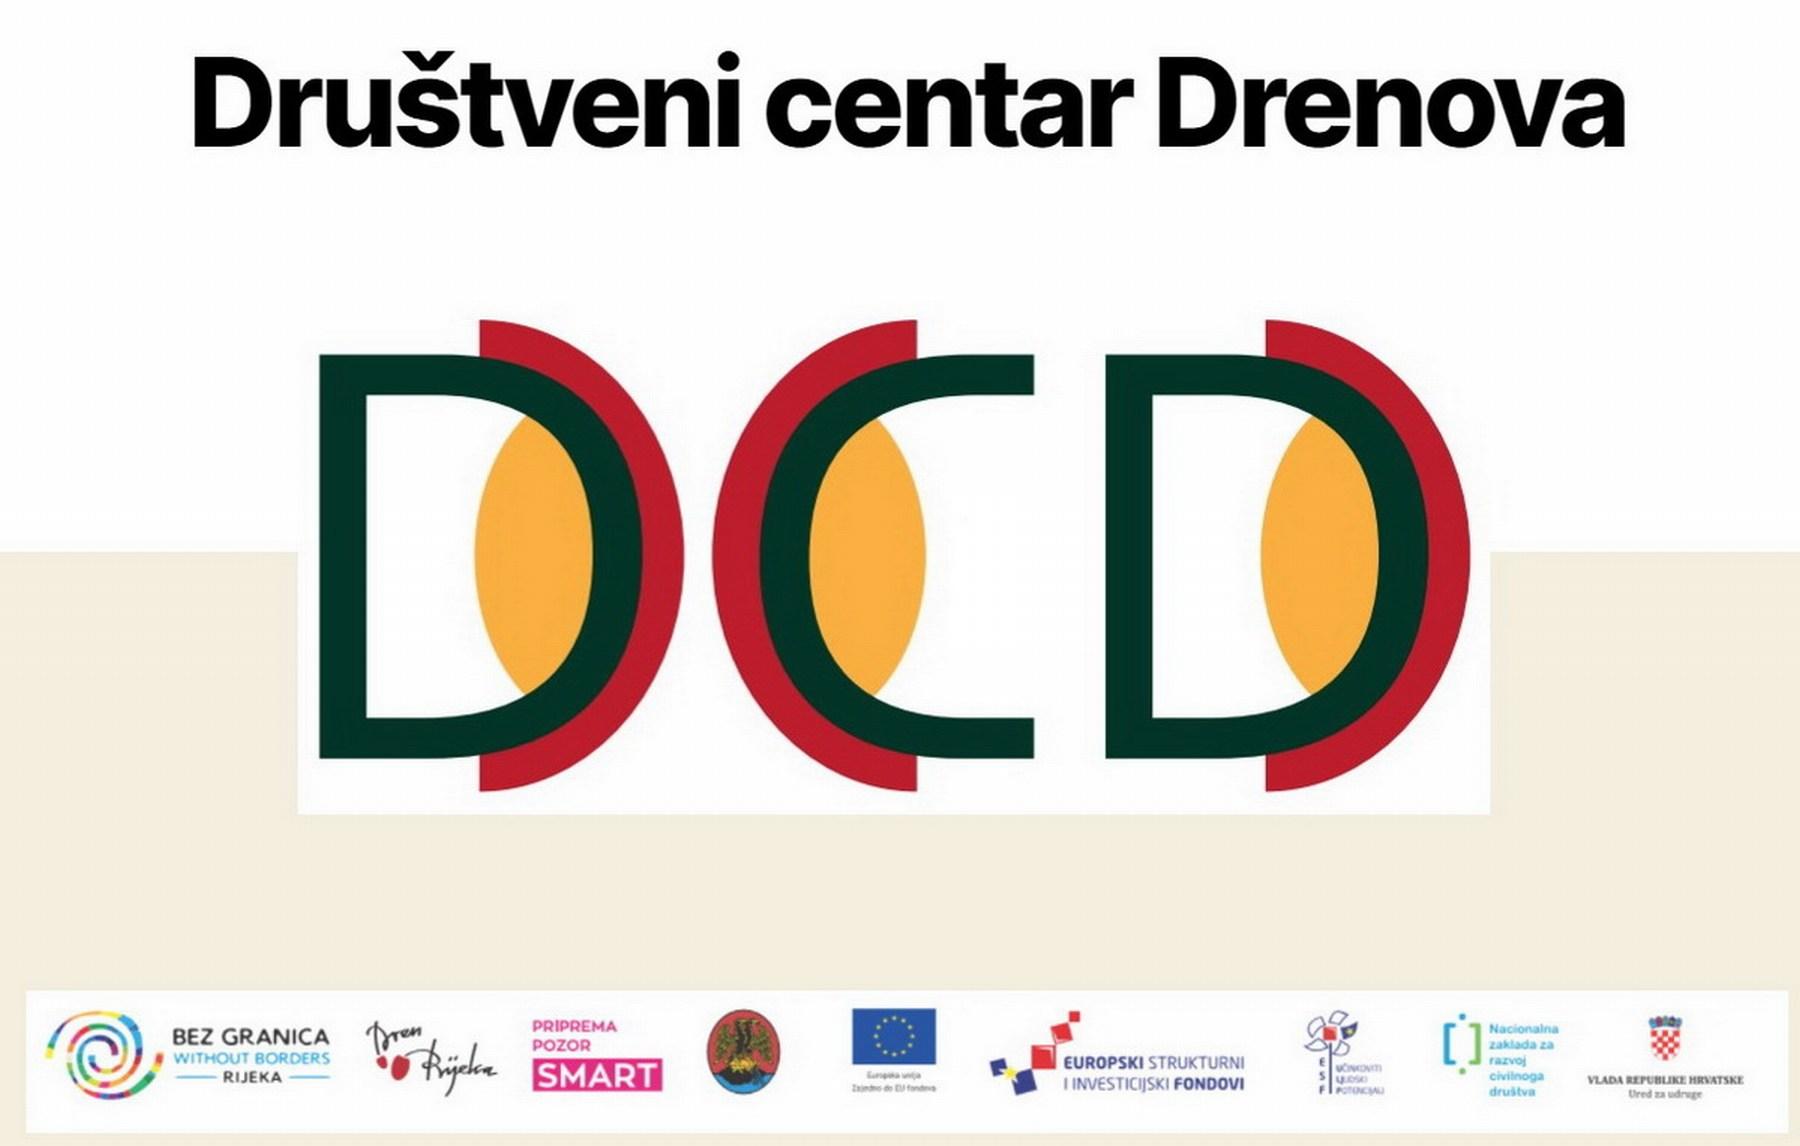 Društveni-centar-Drenova-logo